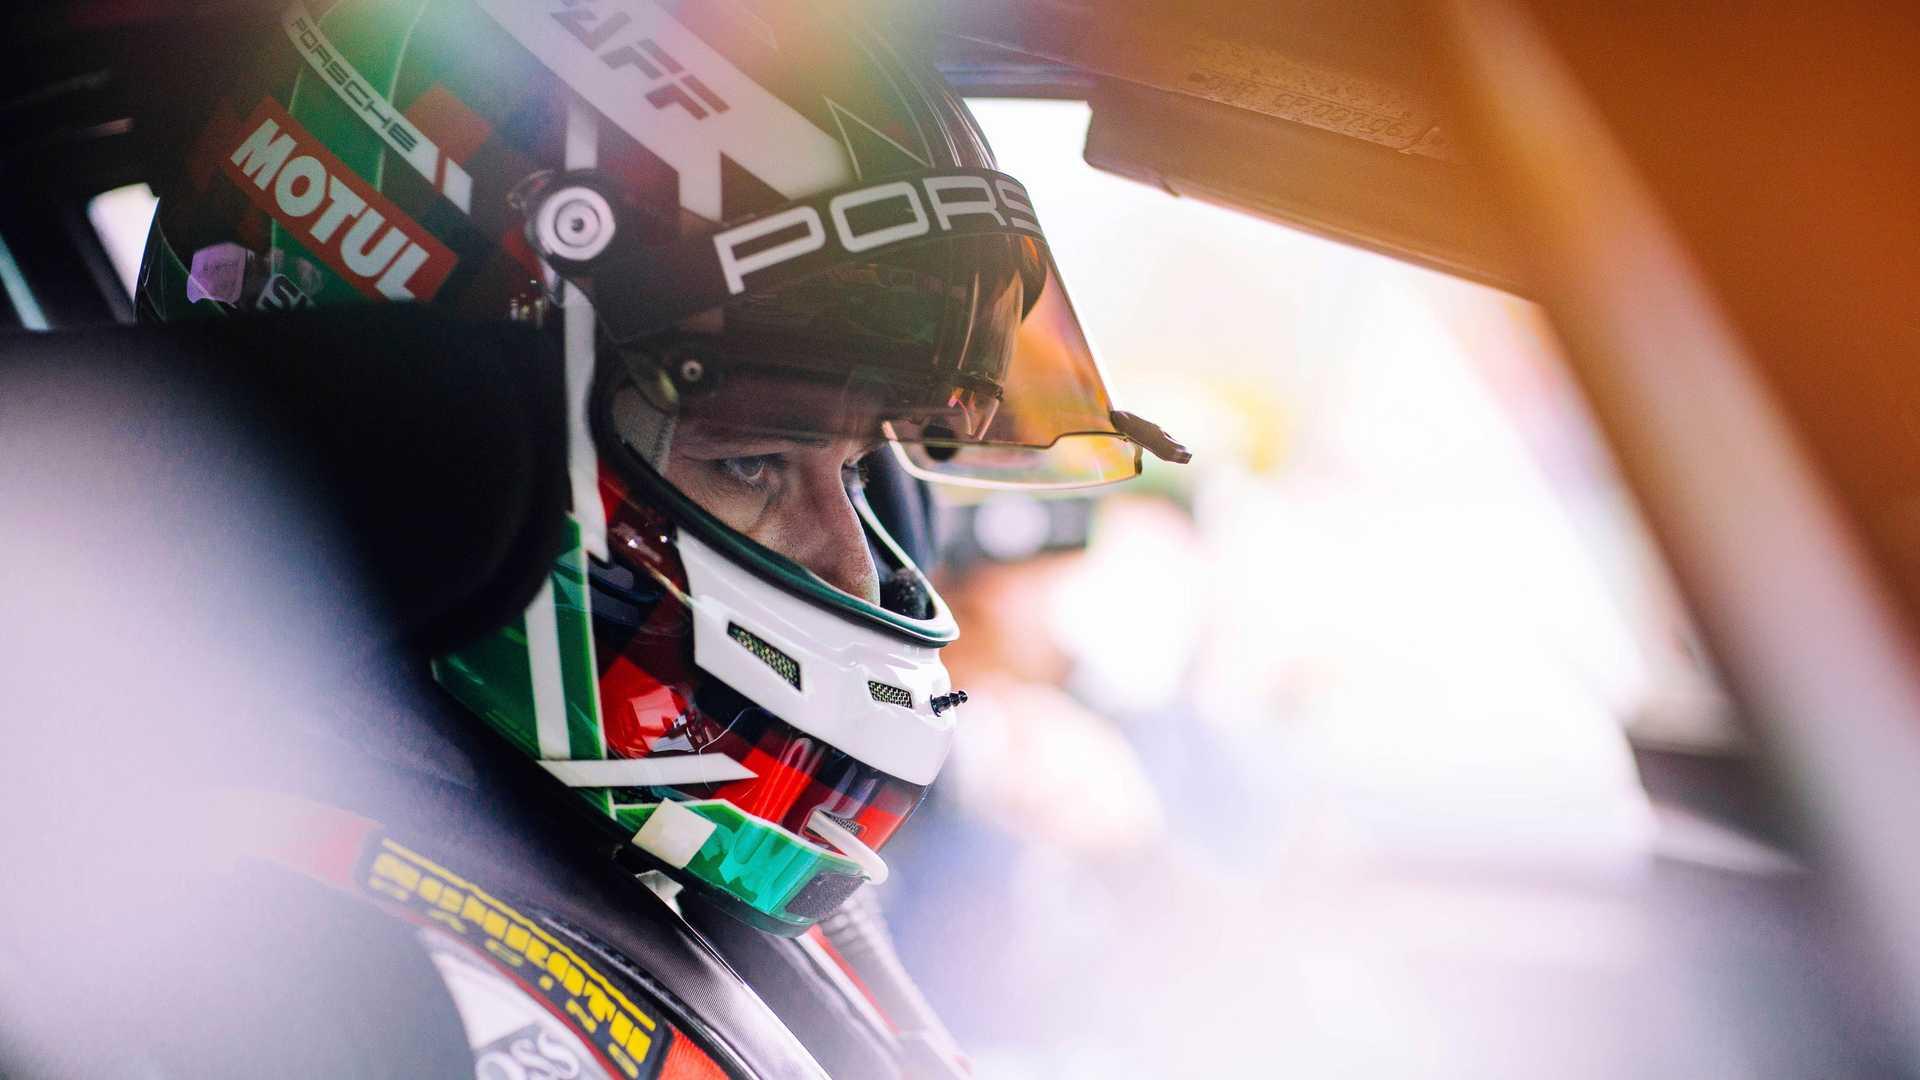 2021-porsche-panamera-sets-fastest-four-door-porsche-record-at-the-nurburgring-8